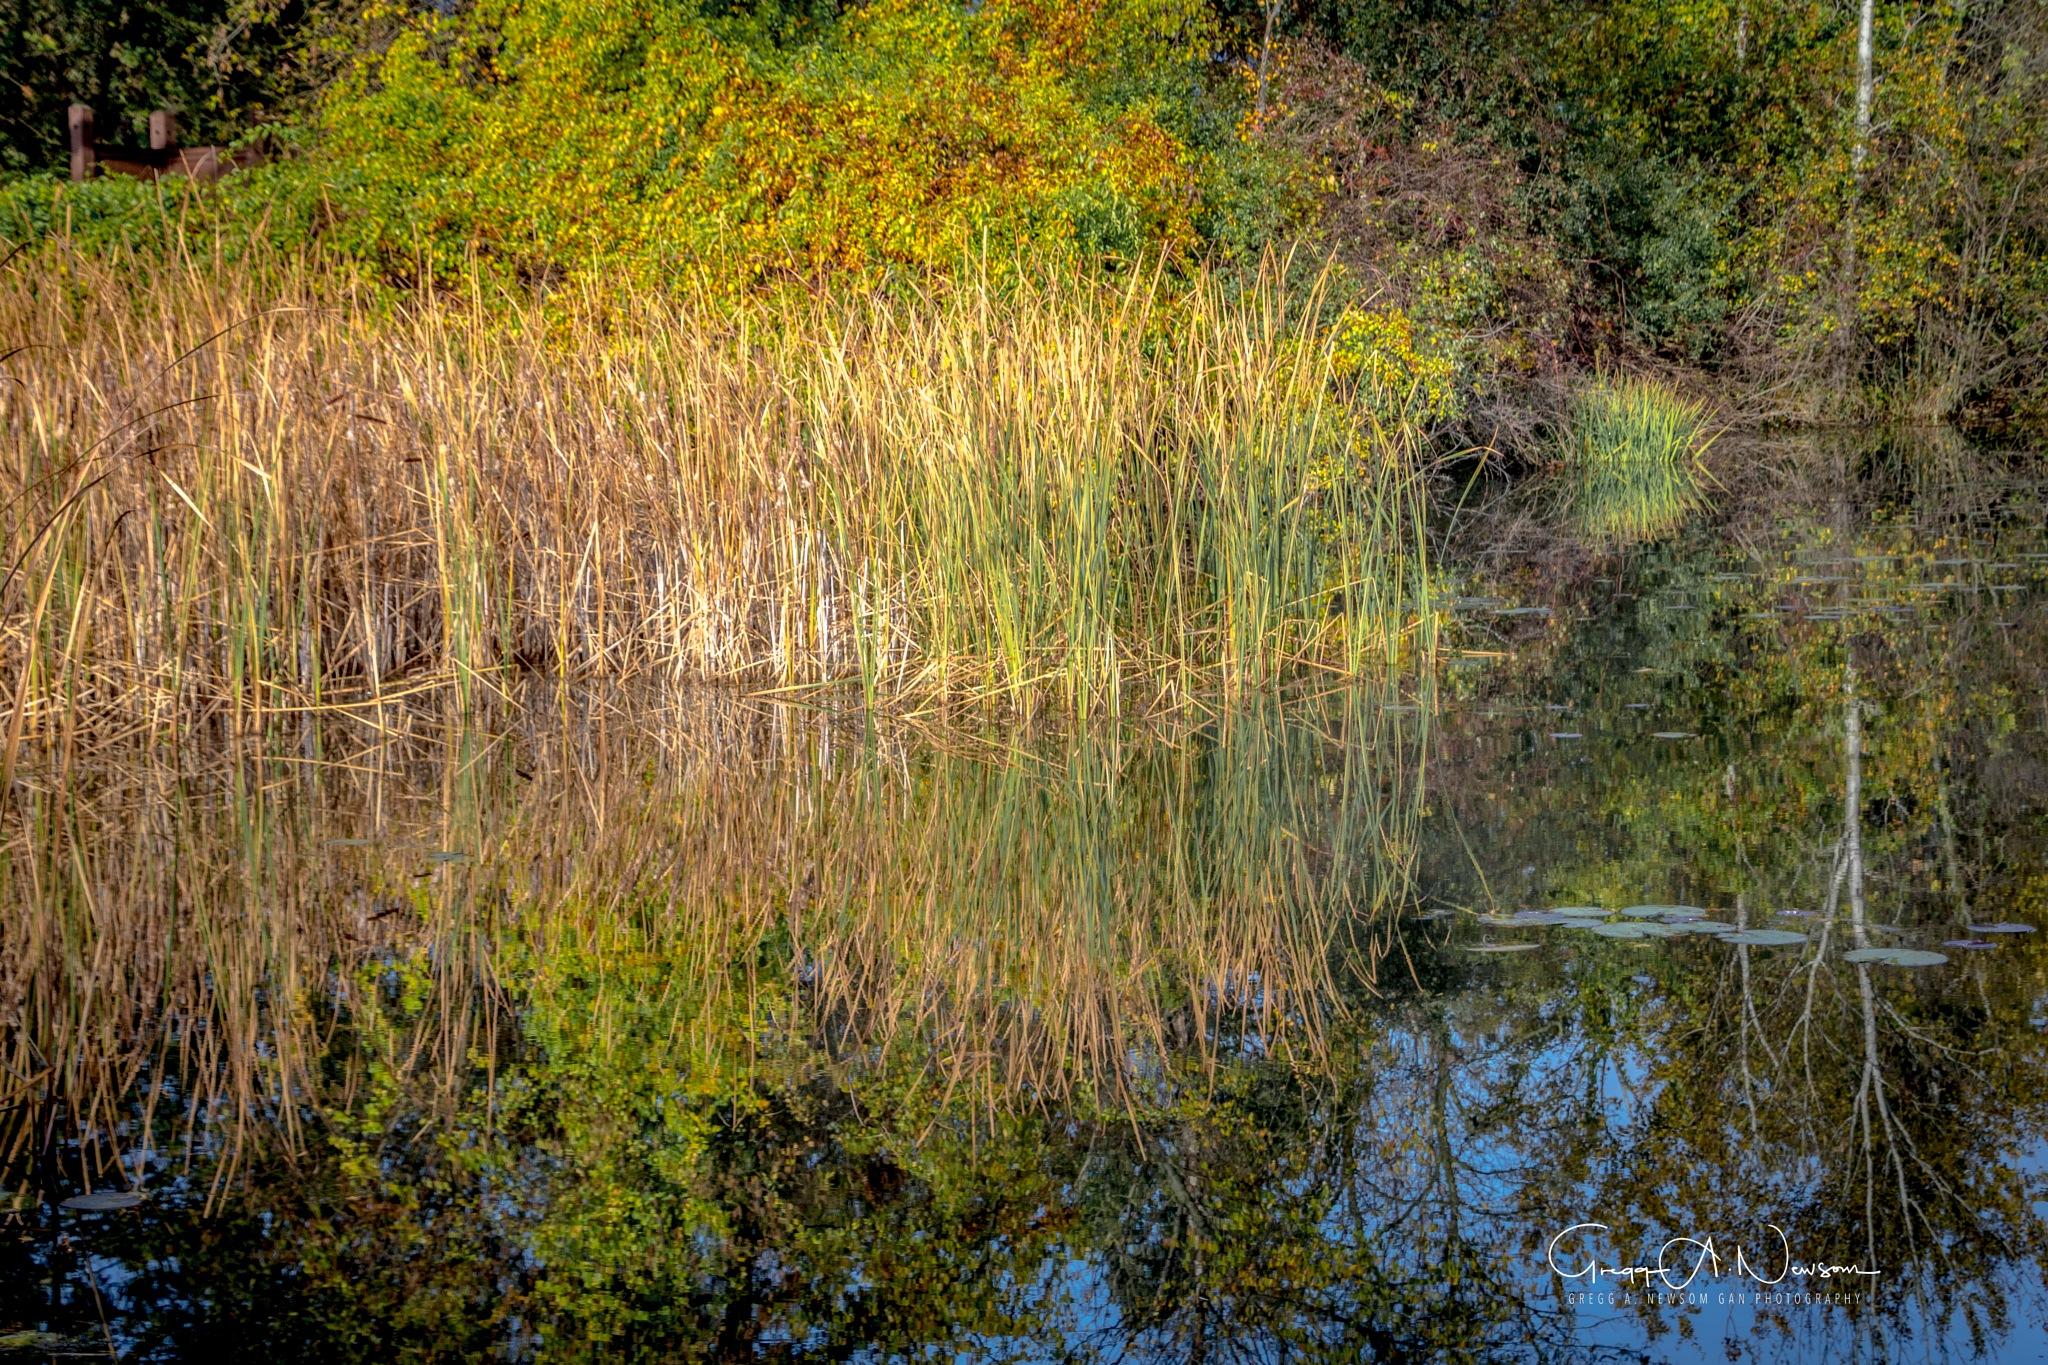 Reflections 6 by Gnewsom324